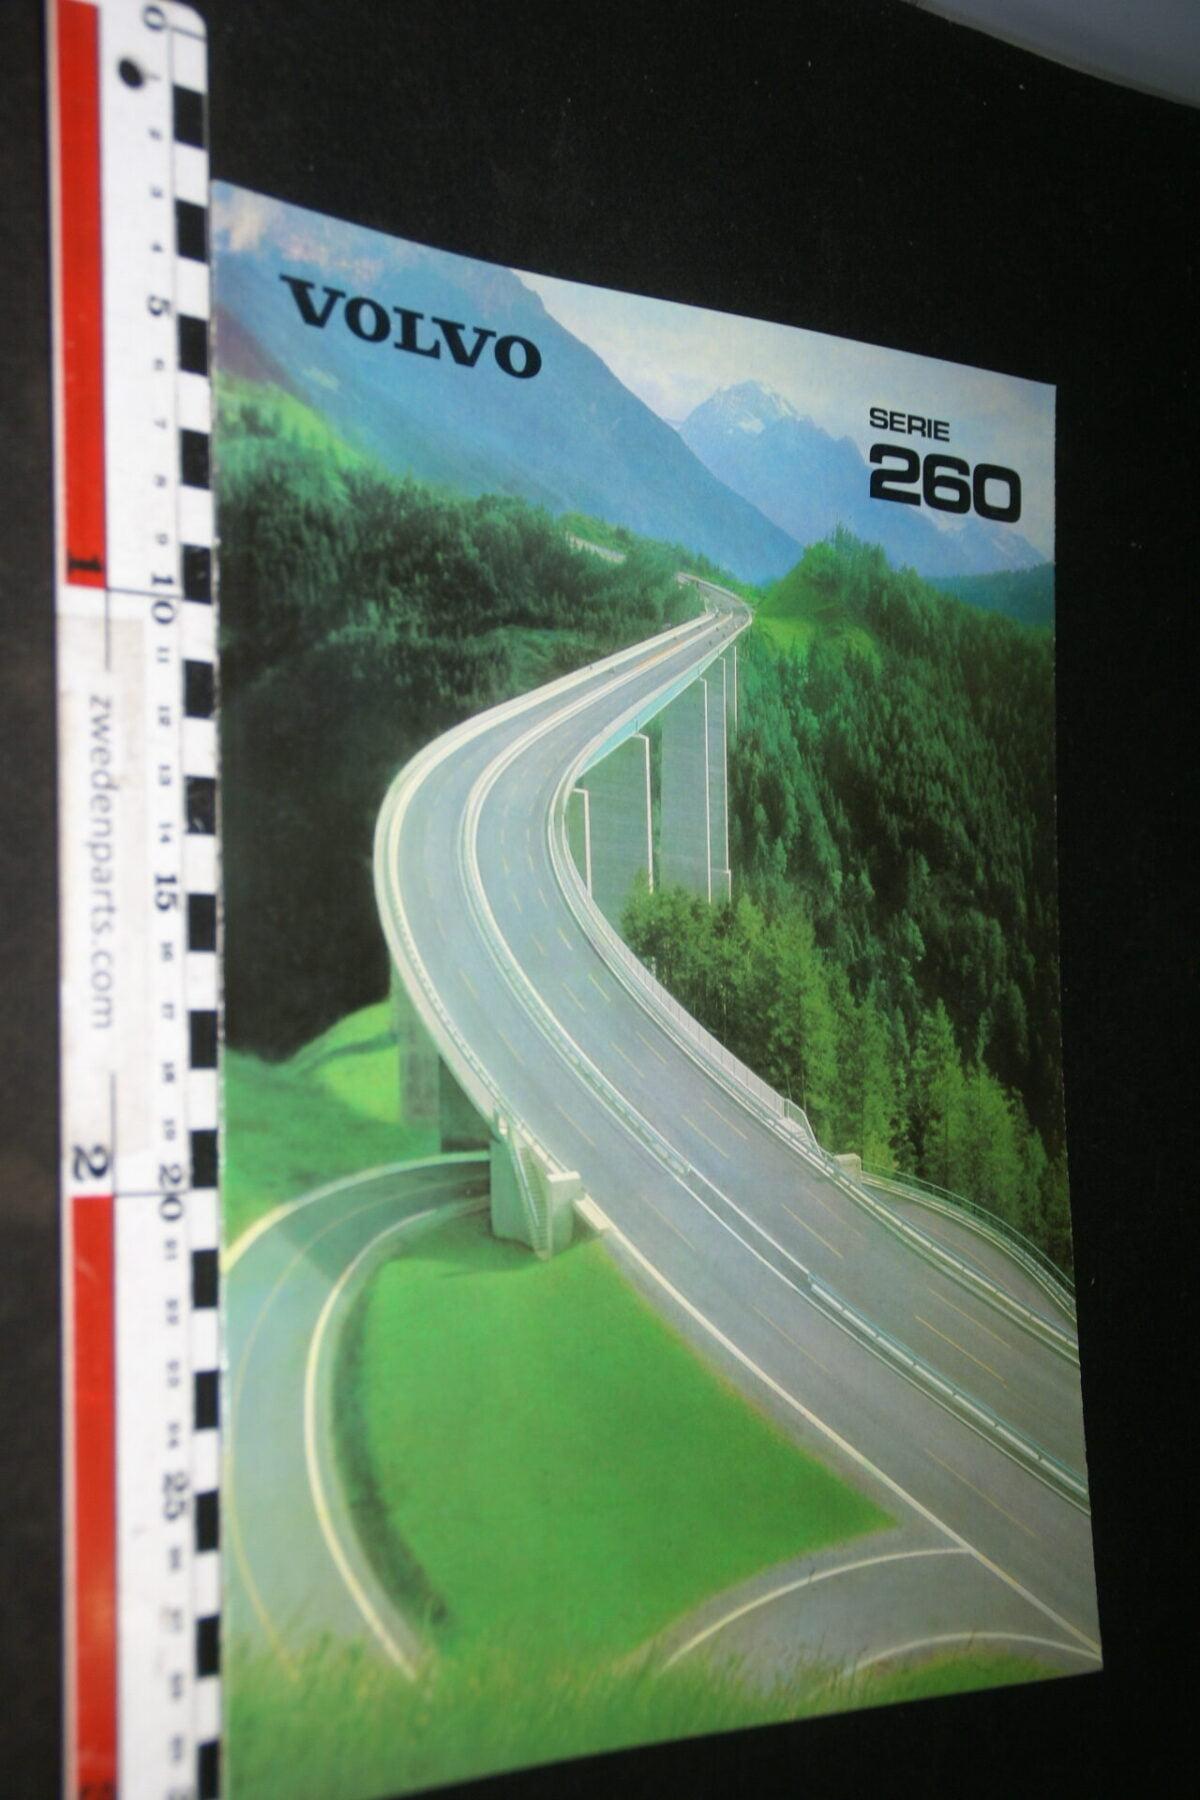 DSC06764 1980 originele brochure Volvo serie 260  met 262C nr. ASPPV 7562-99a22155